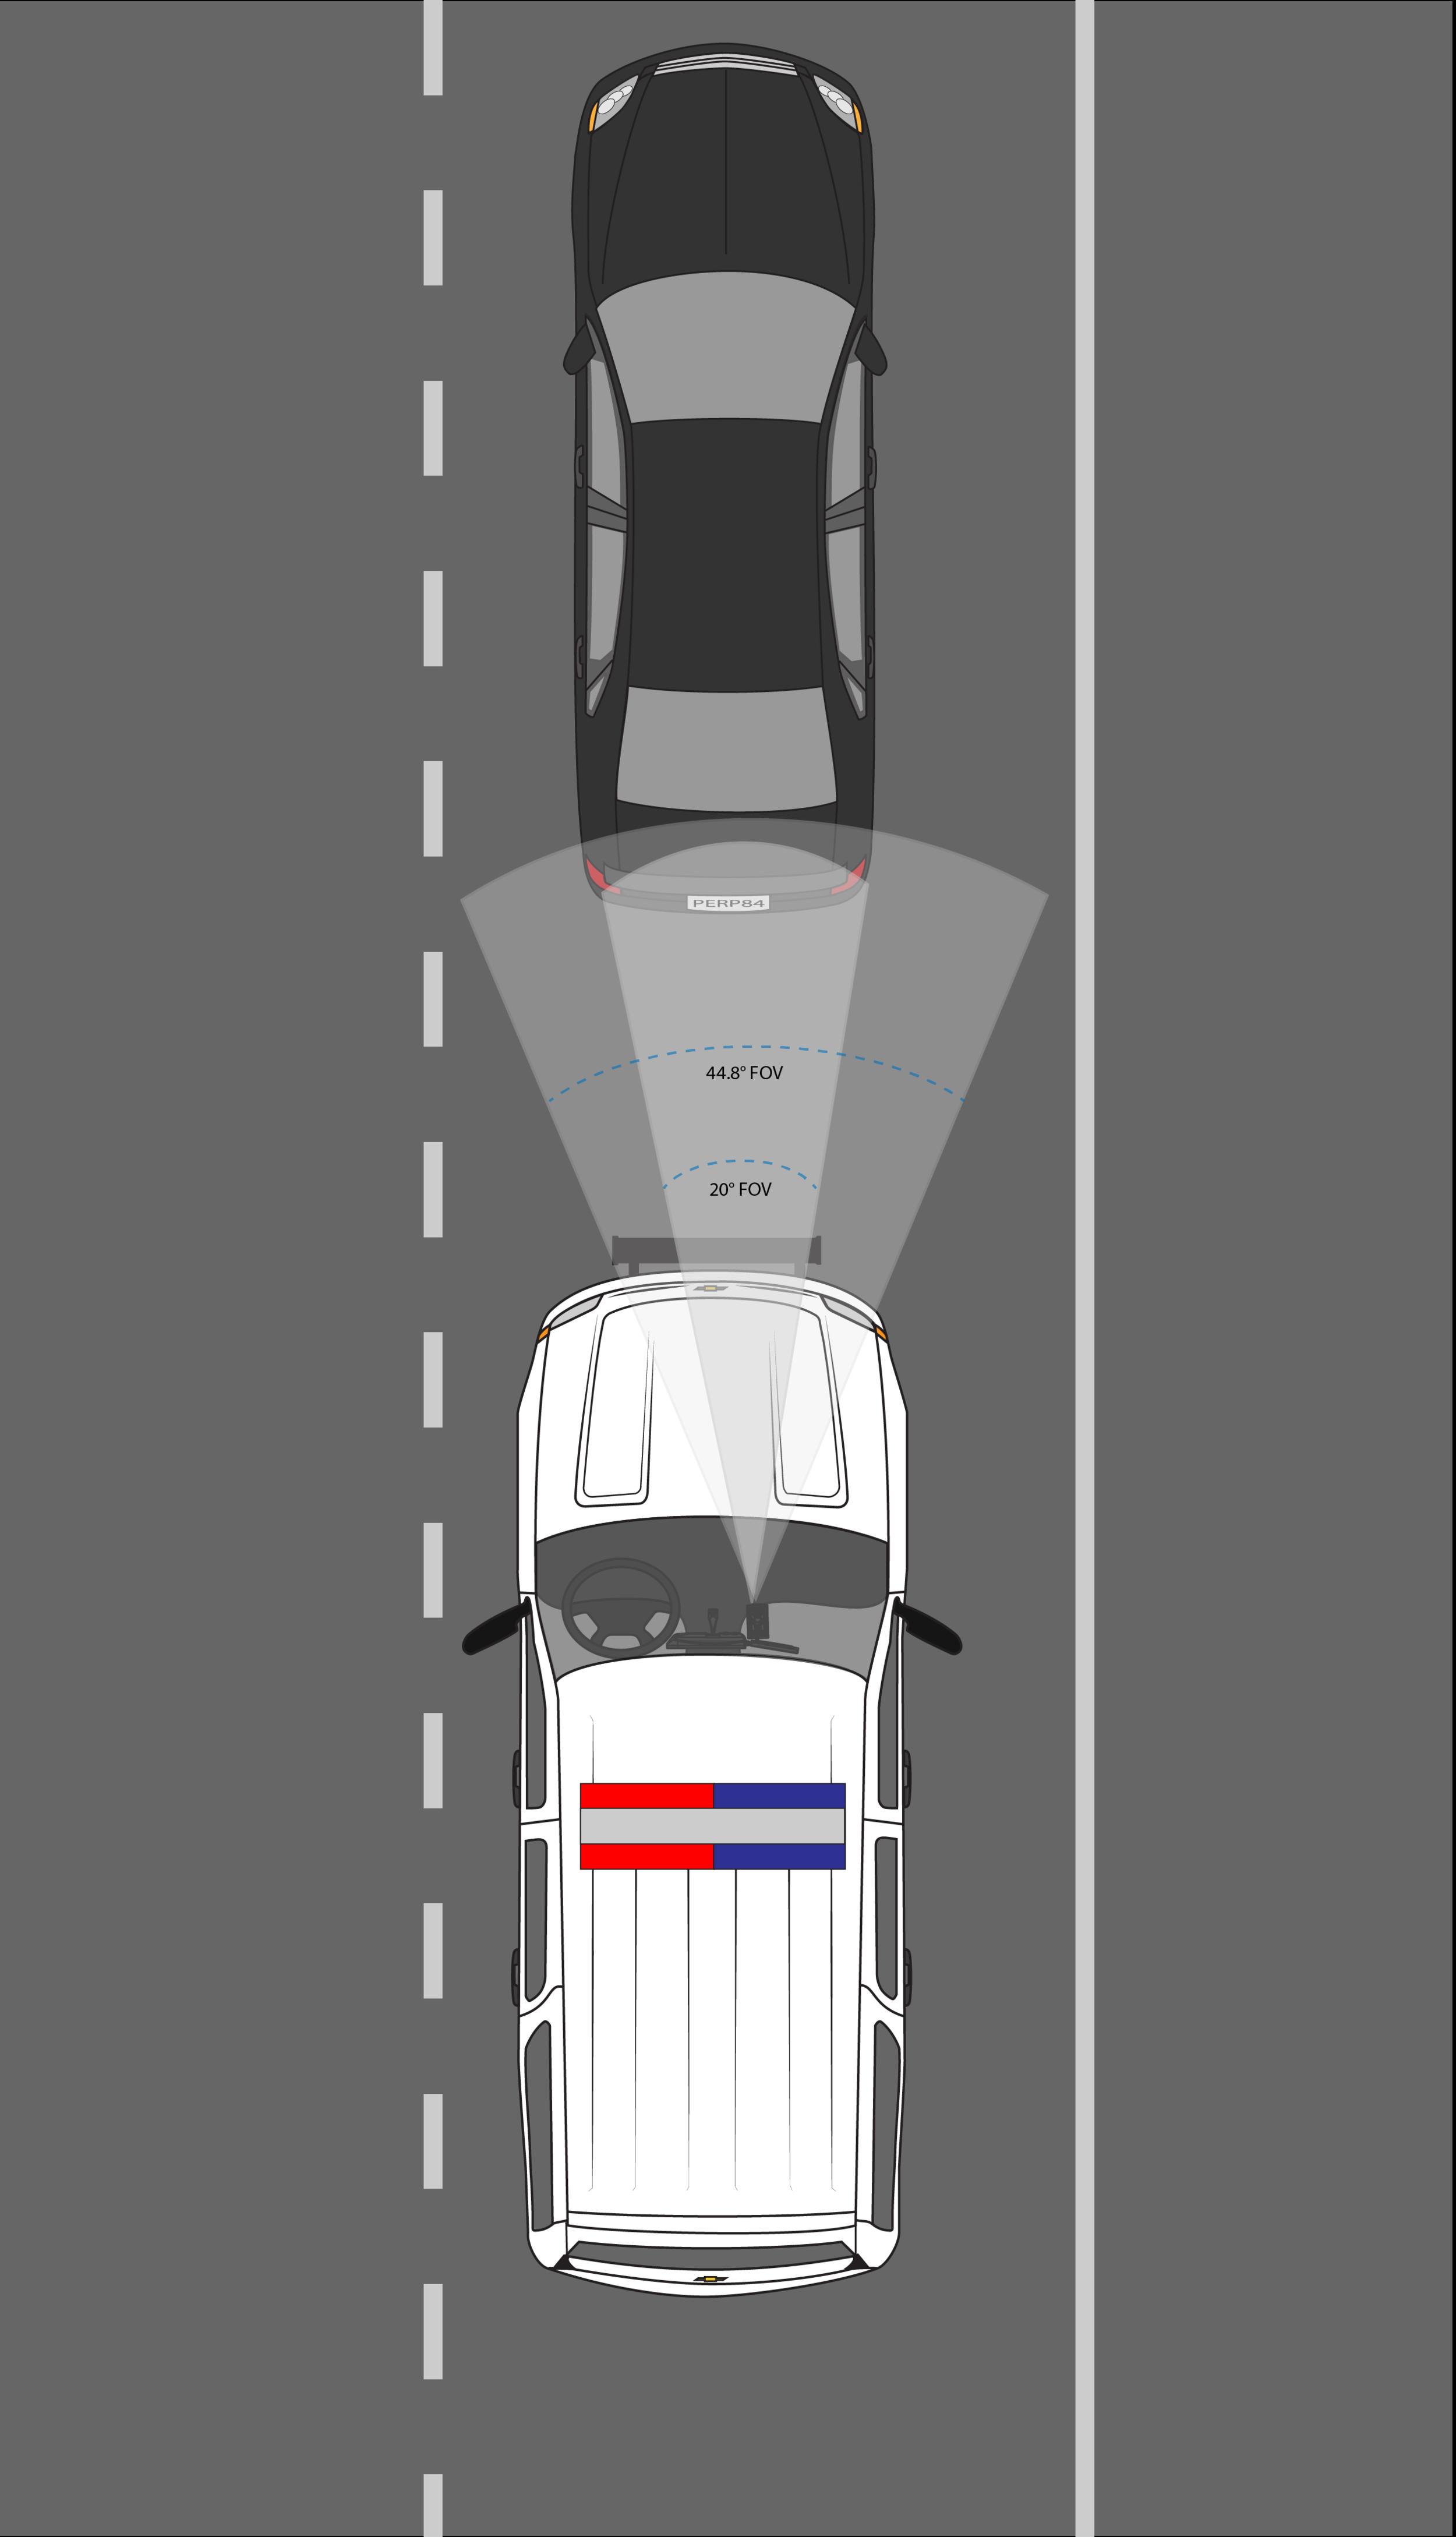 vizucop_camera_fov_diagram-01.png